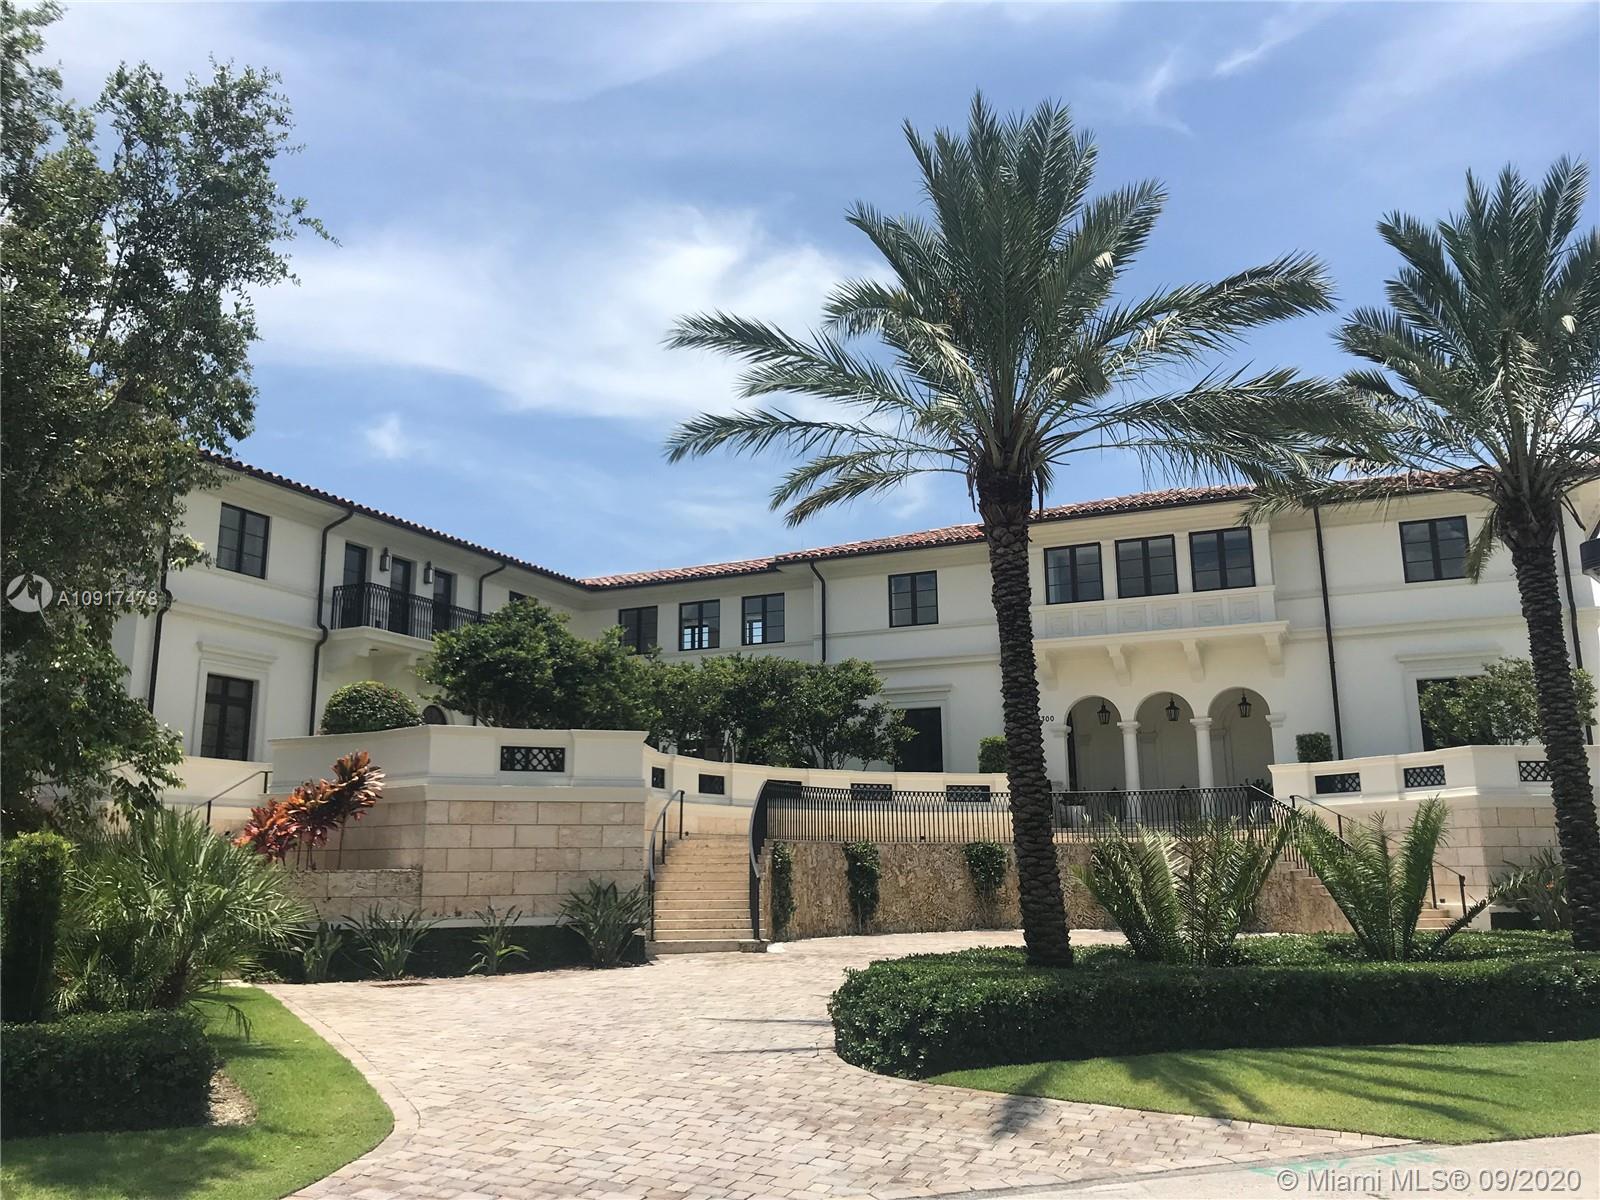 300 Costanera Rd Luxury Real Estate